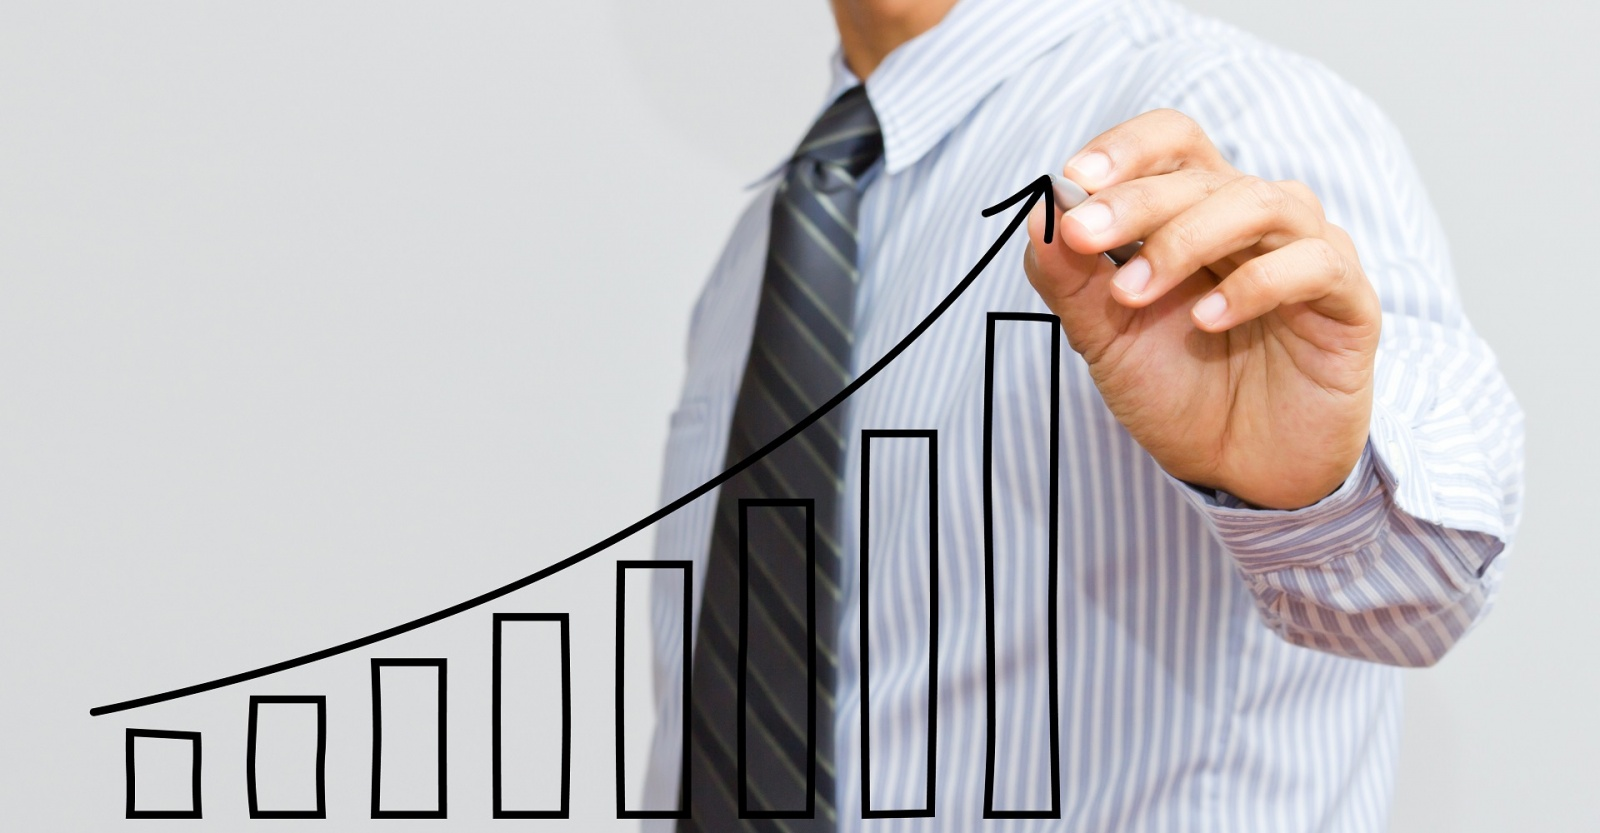 Опасности при измерении продуктивности - 3